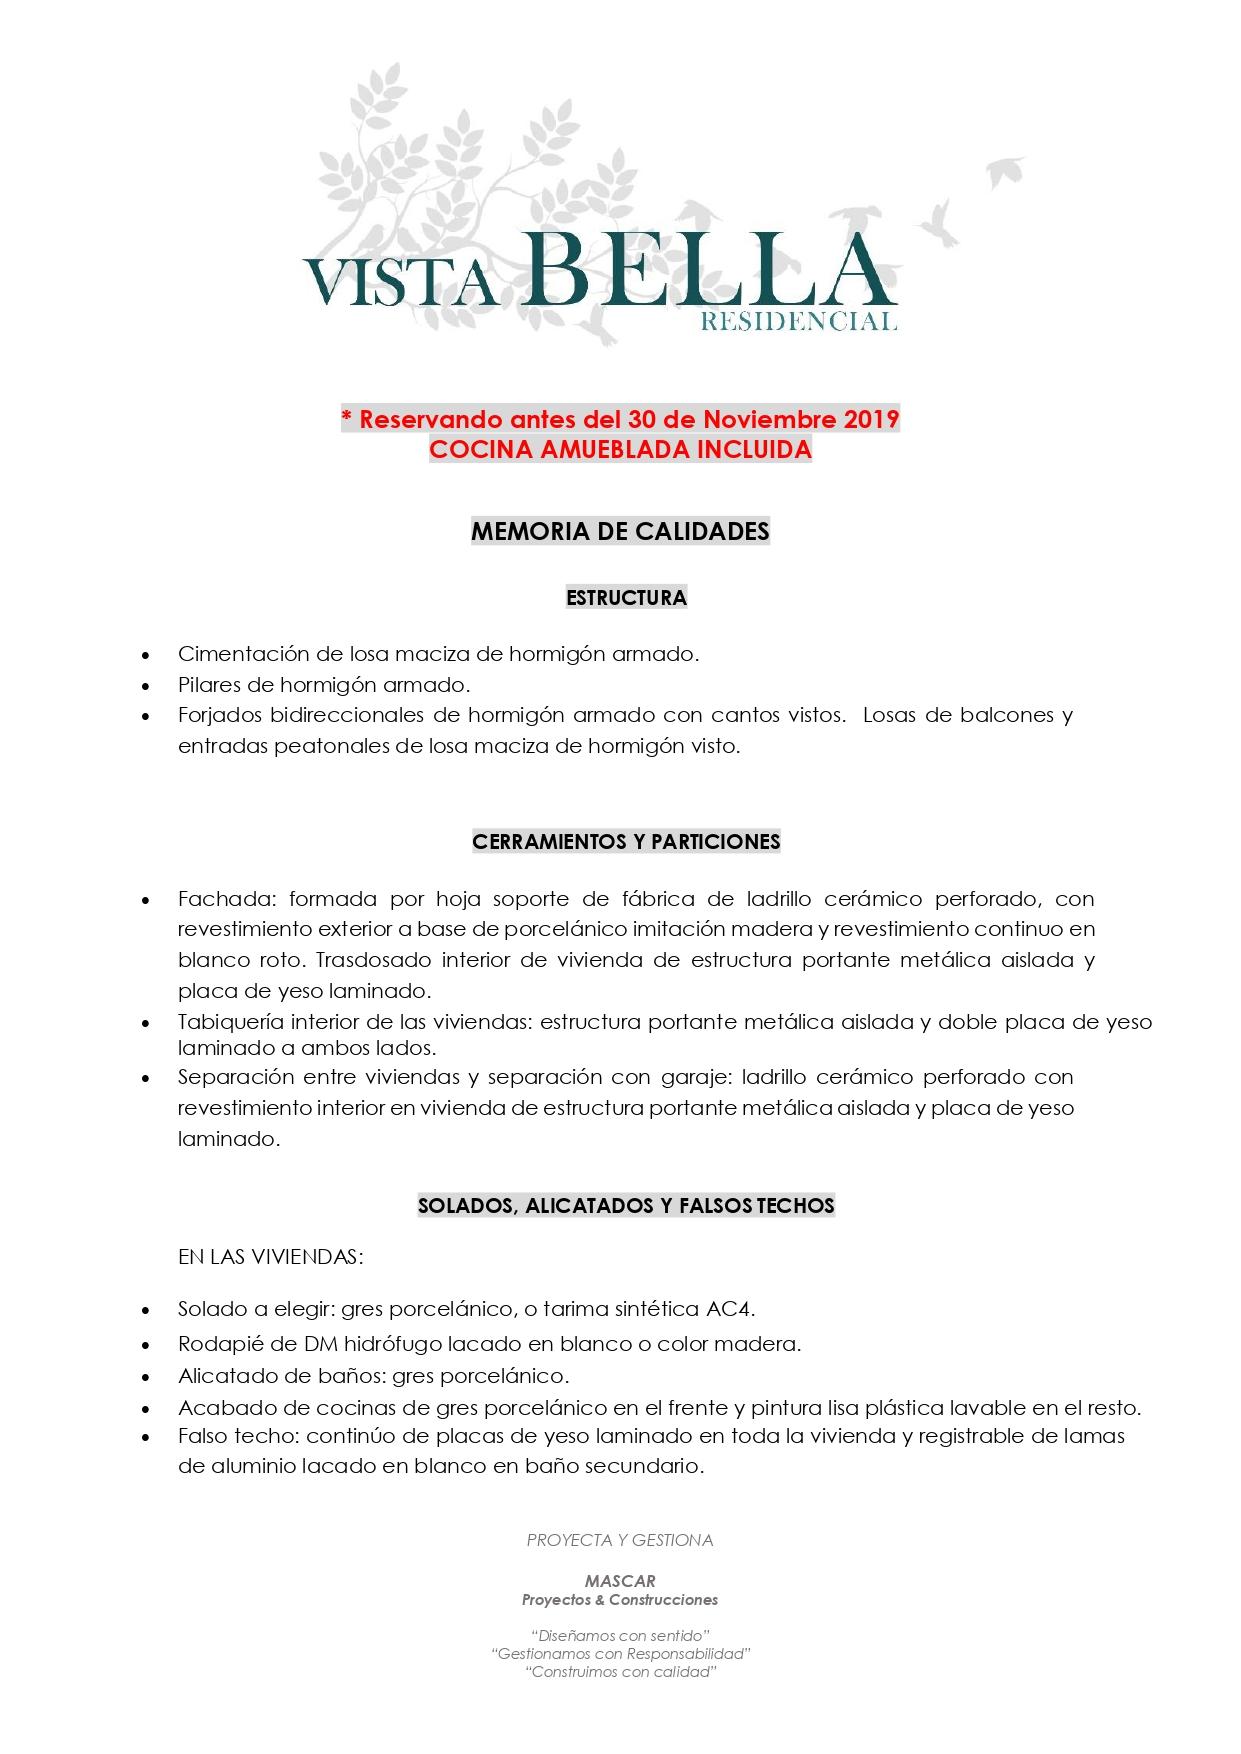 MEMORIA DE CALIDADES - Pag.1